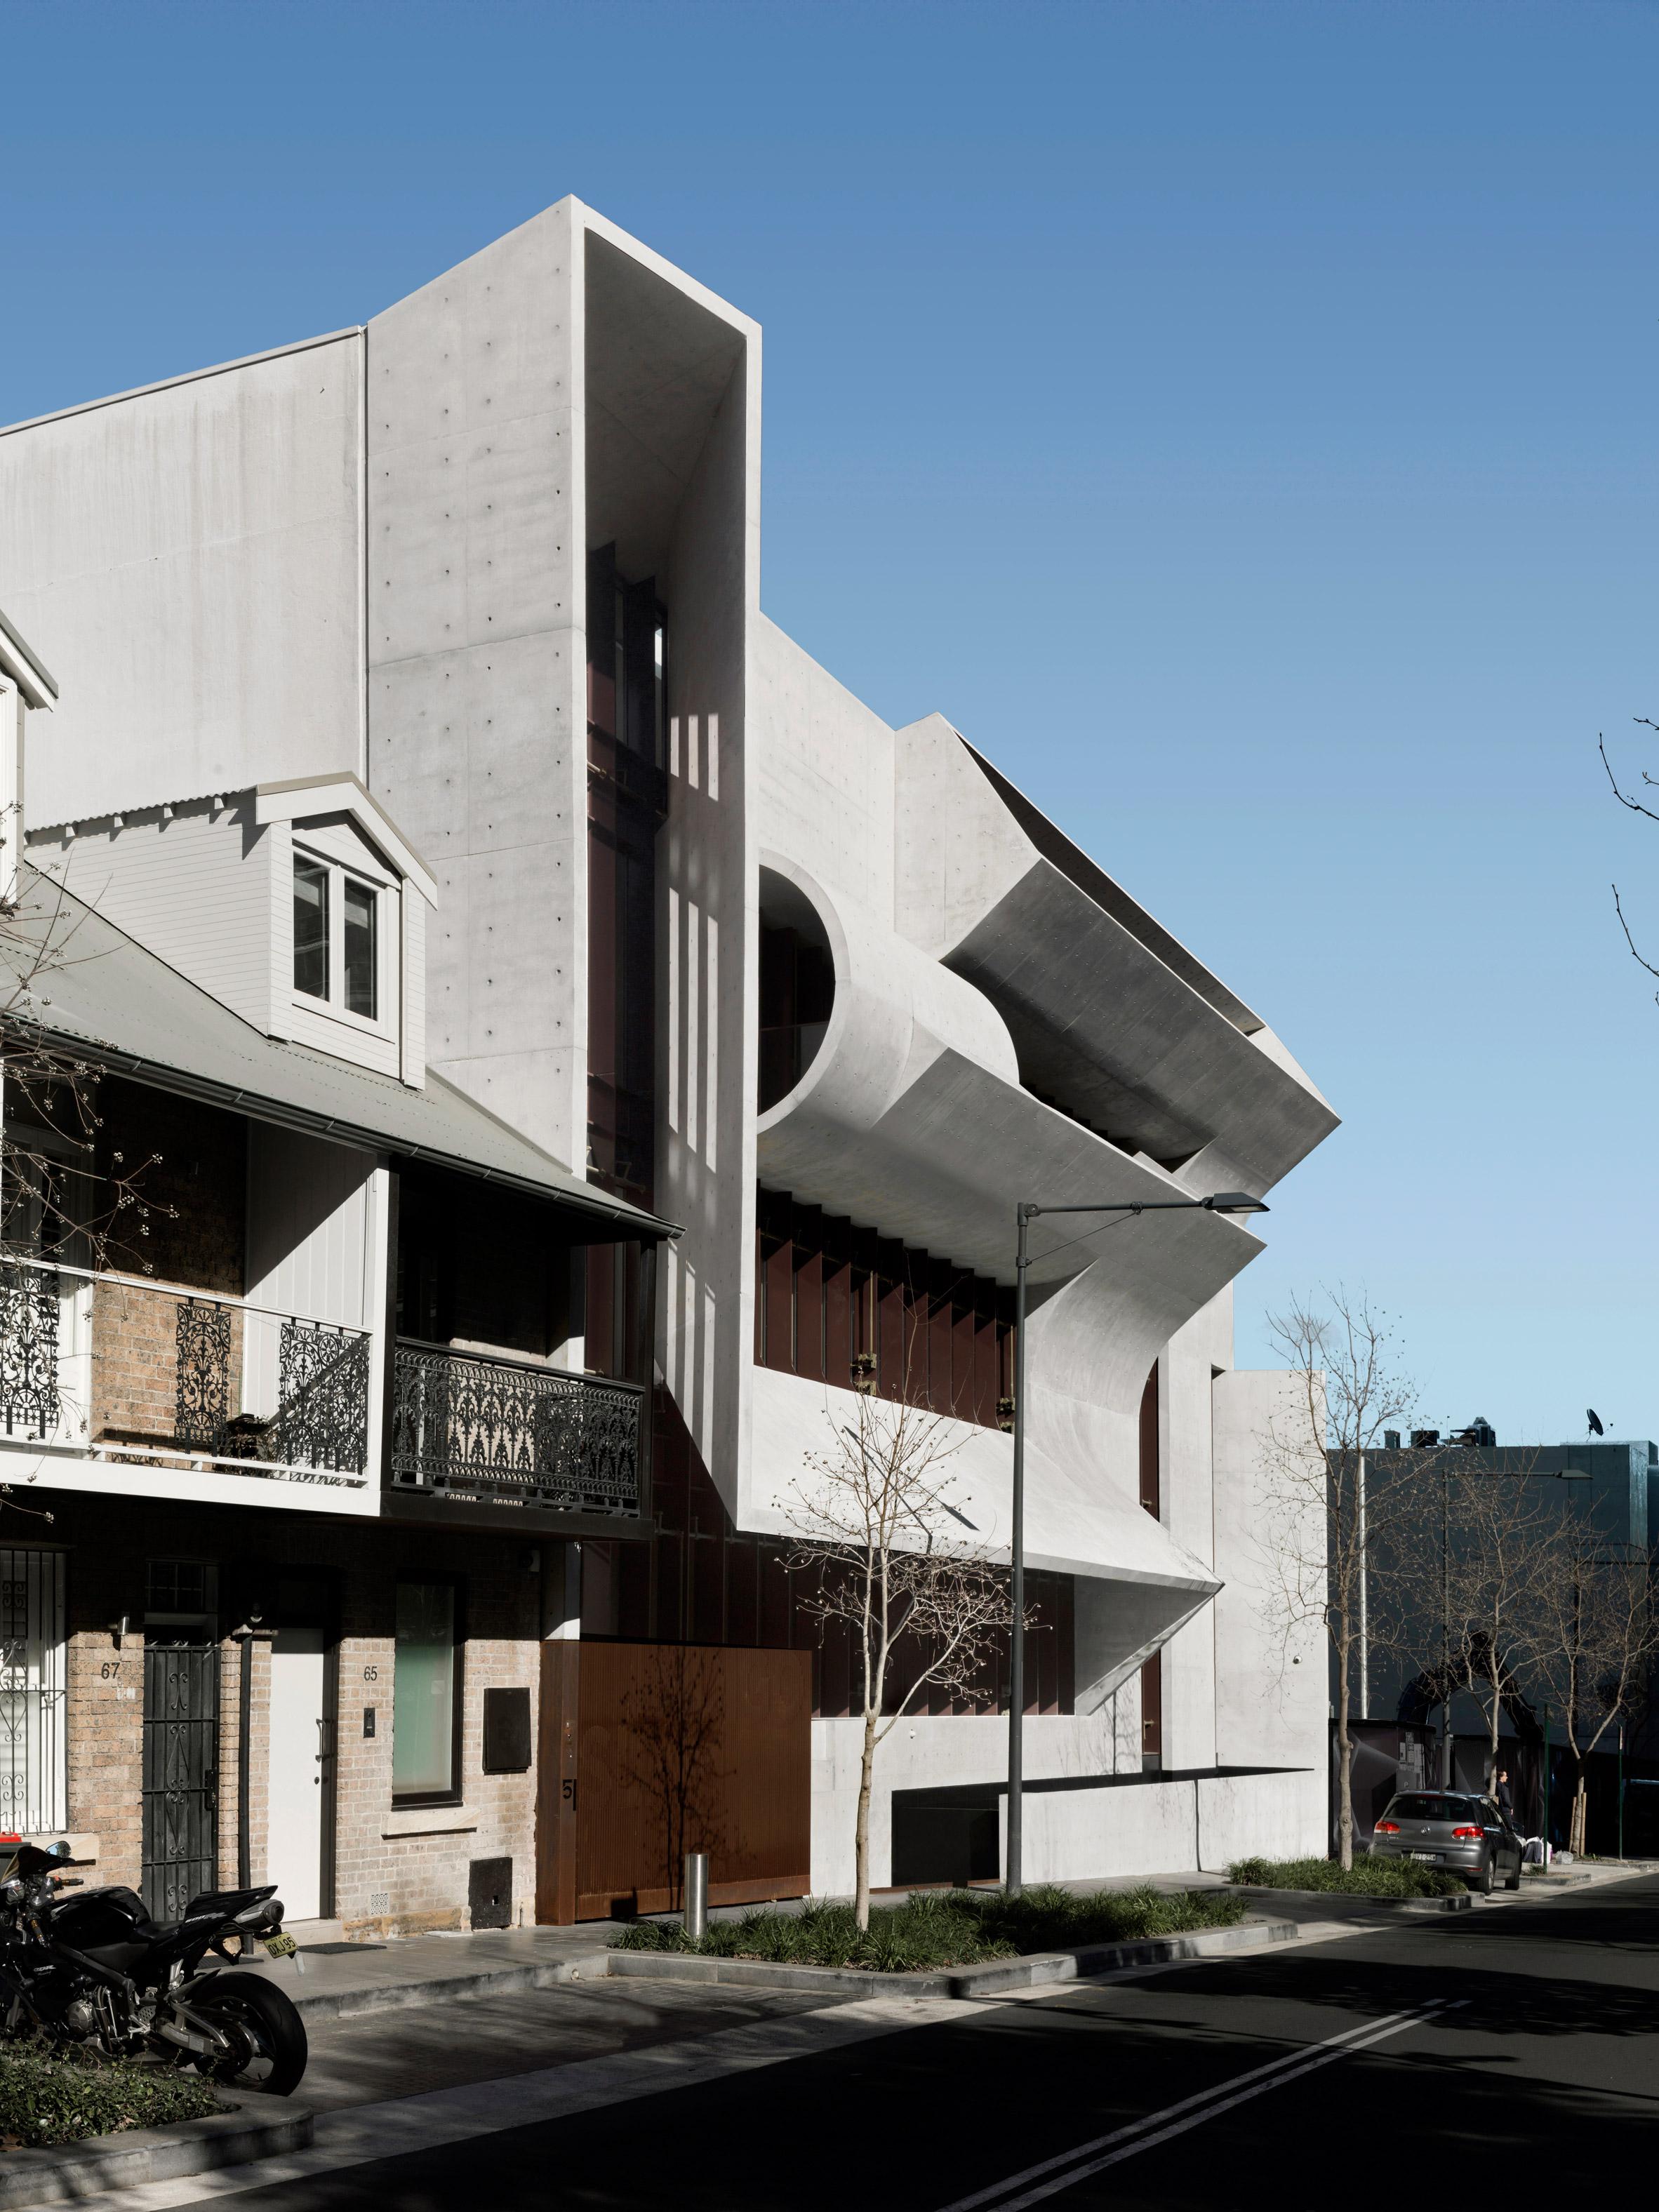 indigo-slam-smart-design-studio-architecture-sydney-australia_1